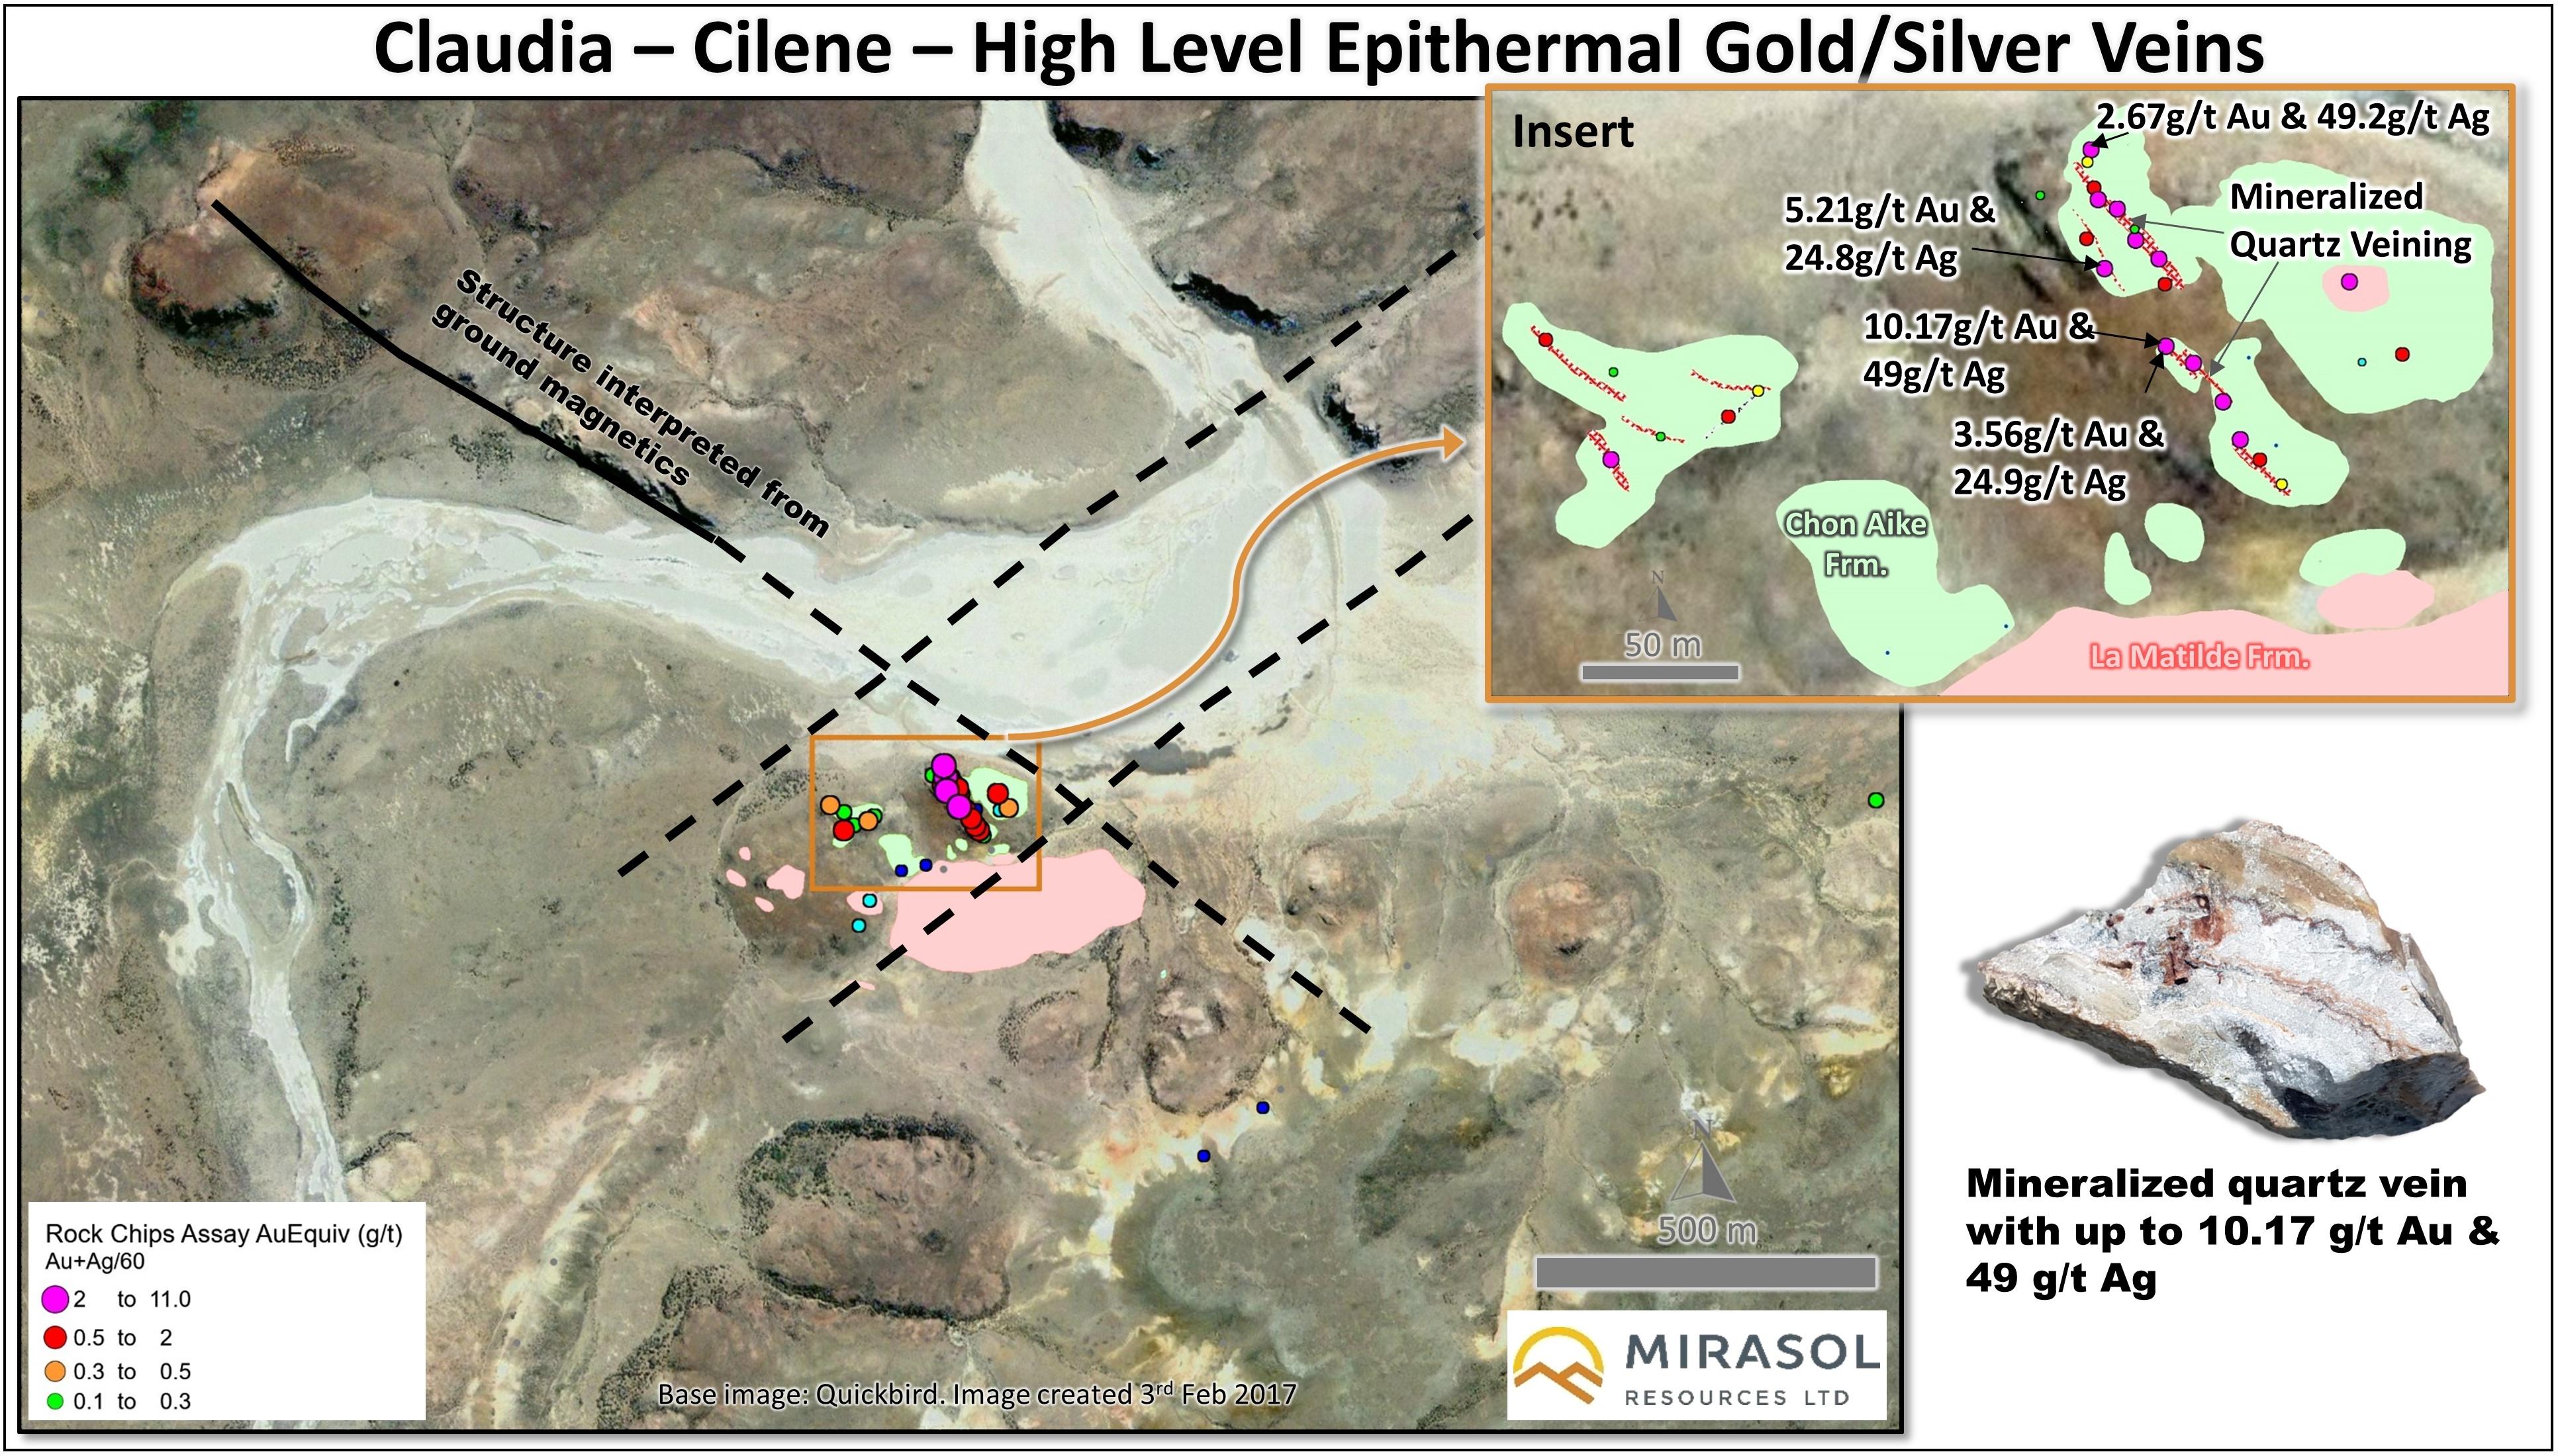 Claudia Gold Silver Project - Mirasol Resources Ltd